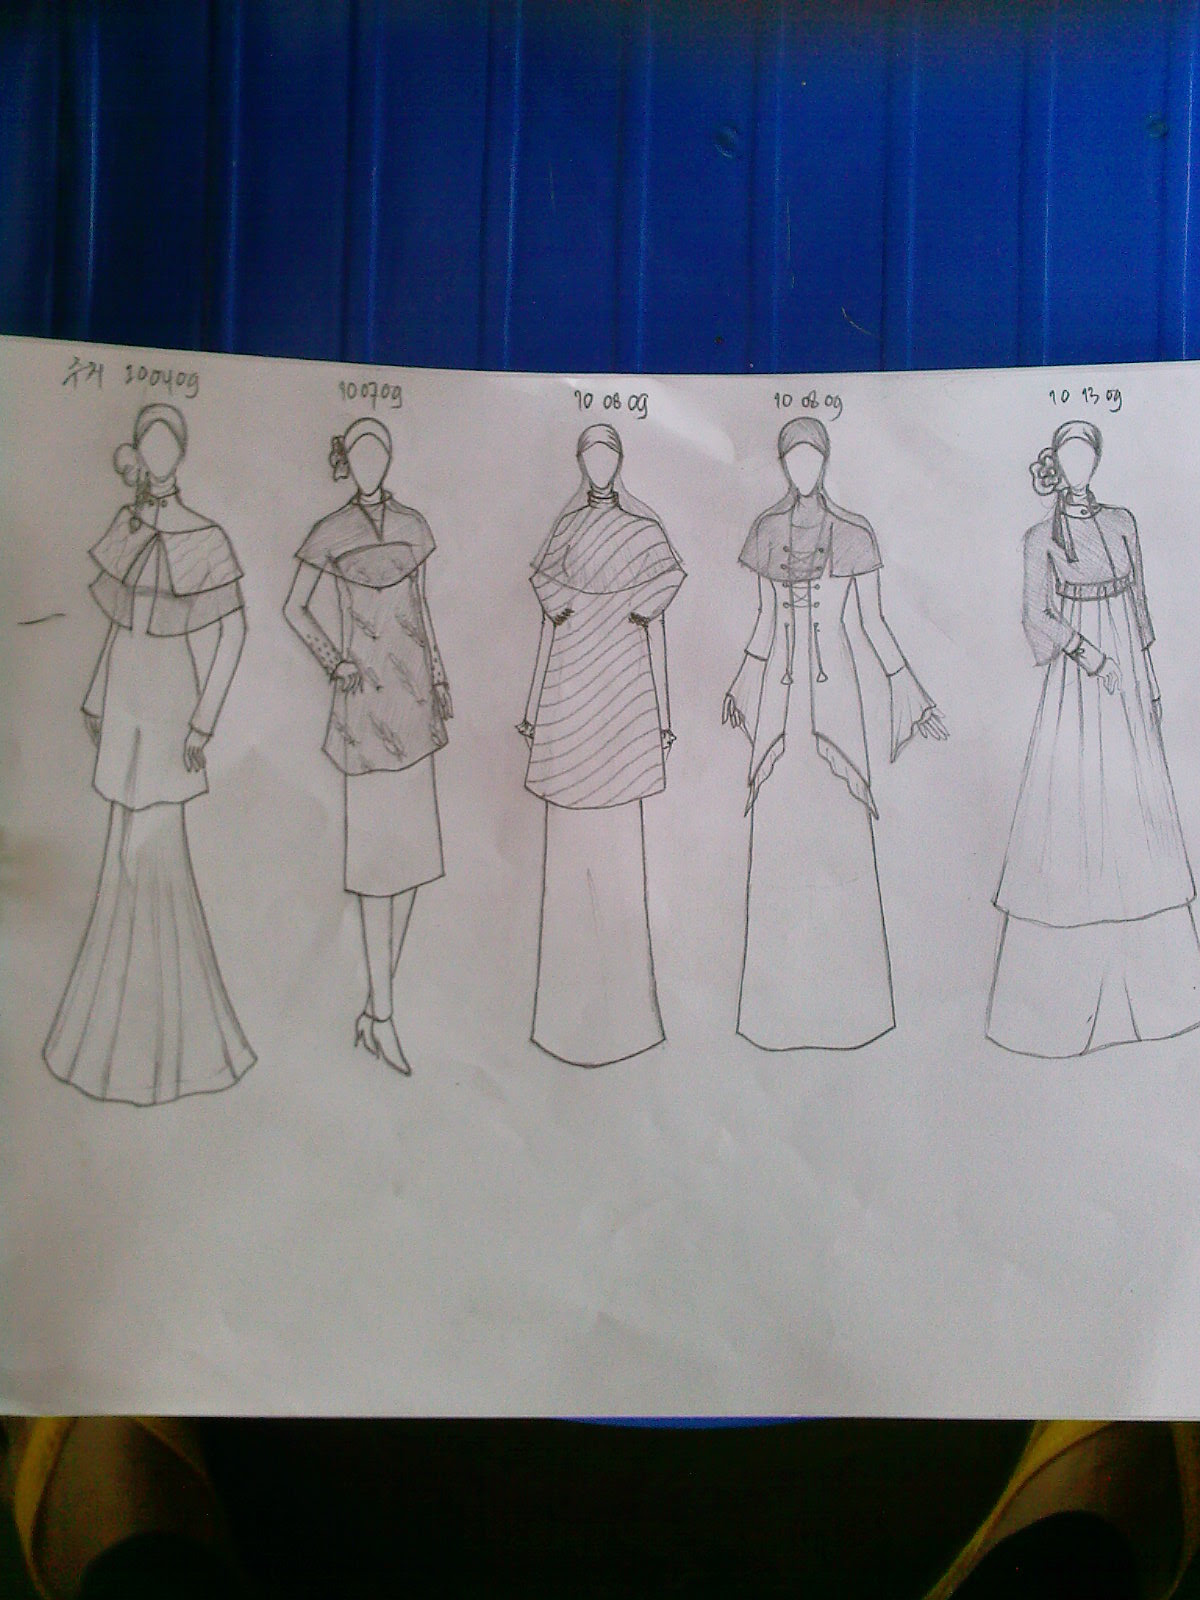 Gambar Sketsa Desain Baju Muslim Remaja  Sobsketsa